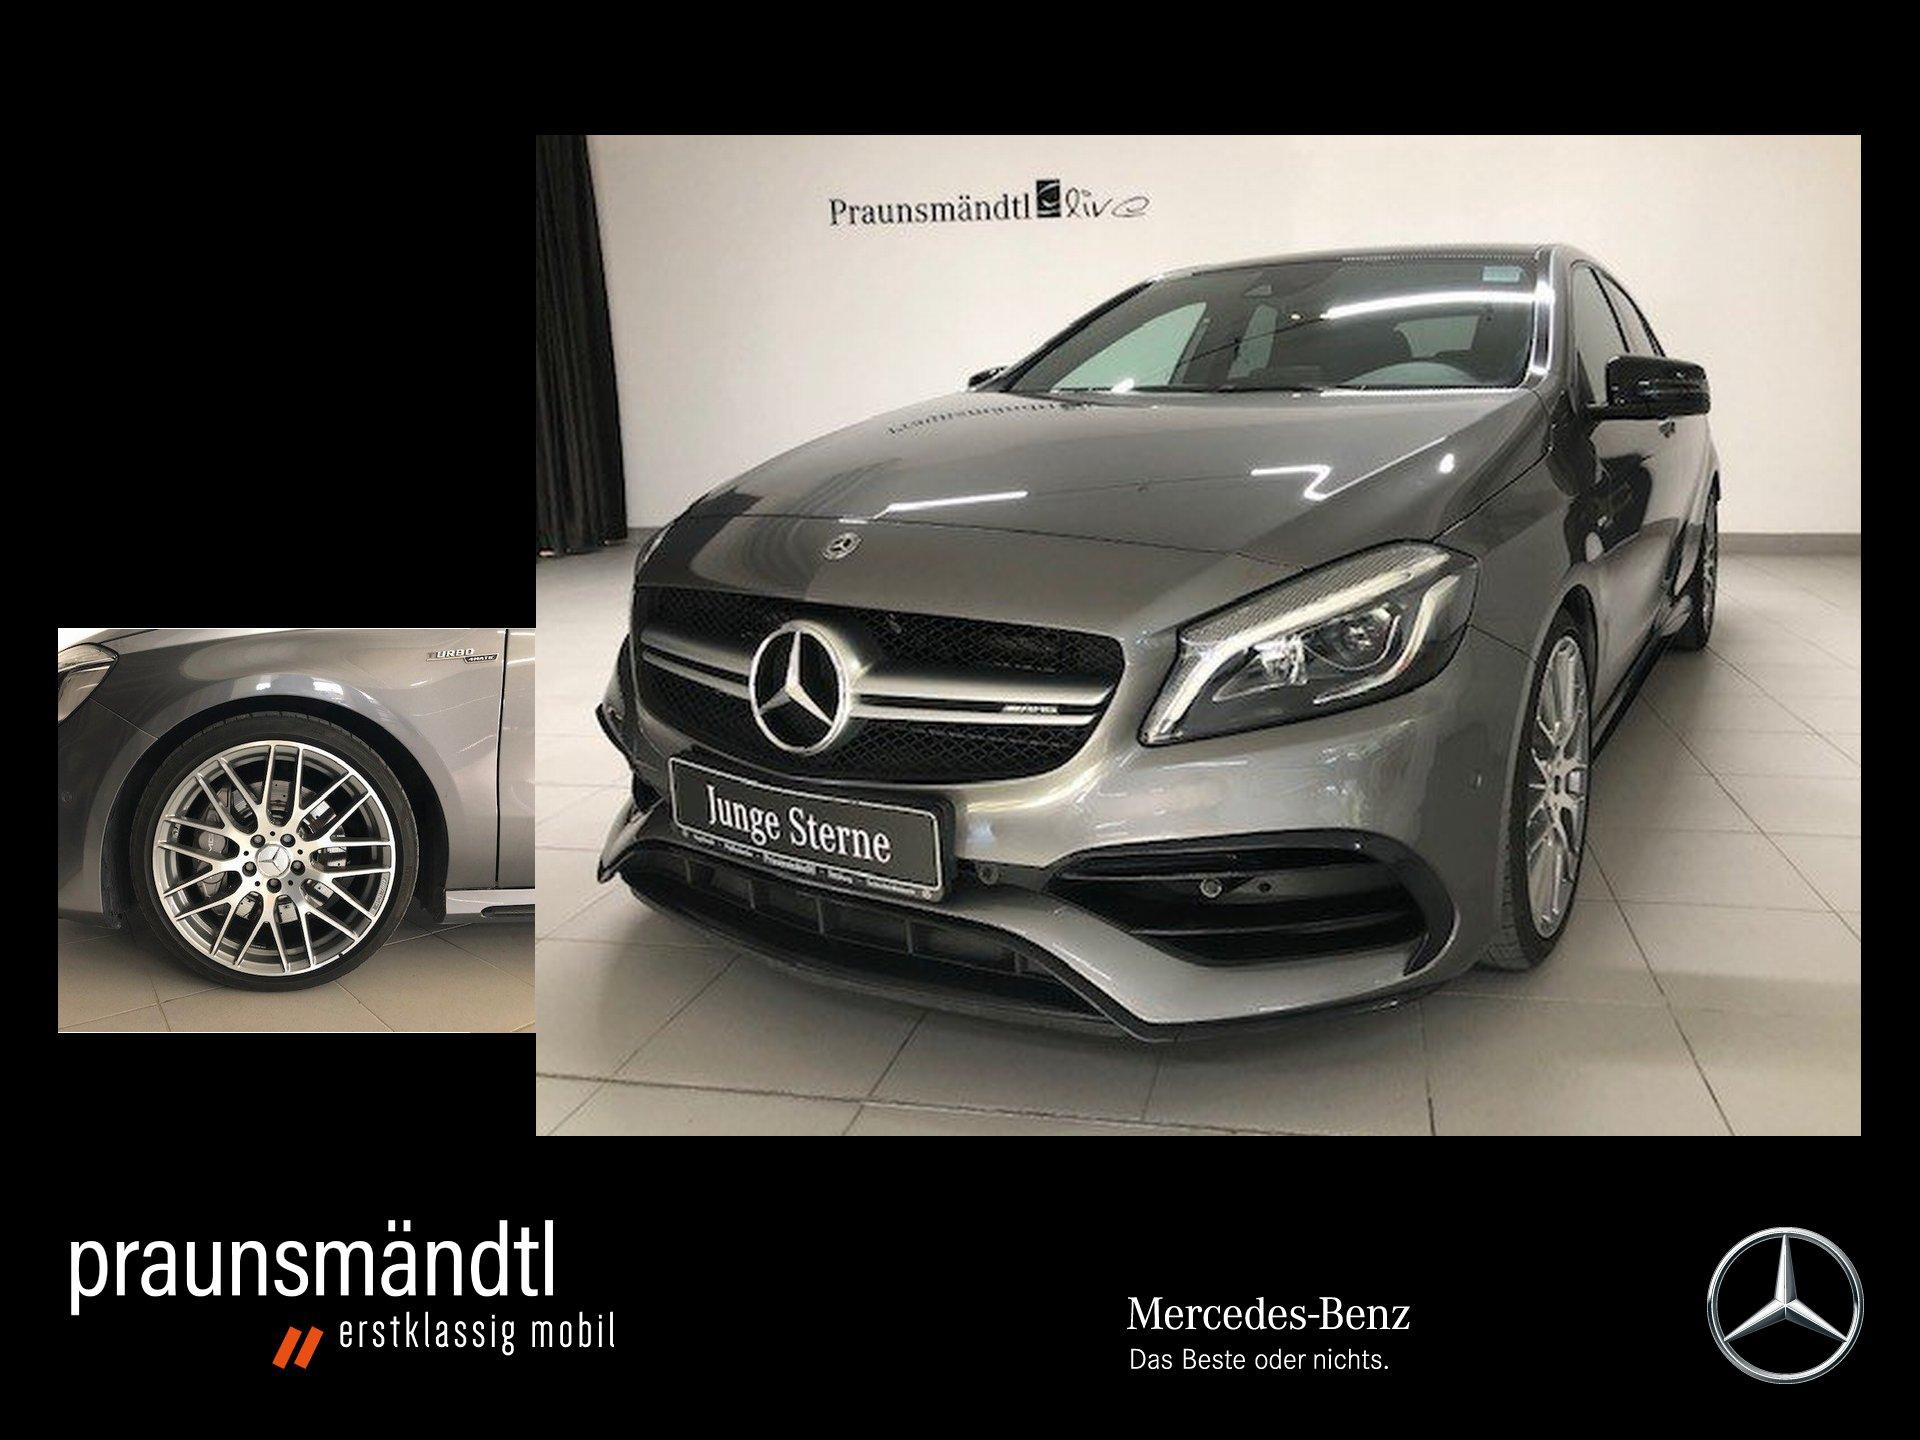 Mercedes-Benz A 45 AMG 4M Drivers/LED/Pano/Com/Sound/Exclusiv, Jahr 2017, Benzin